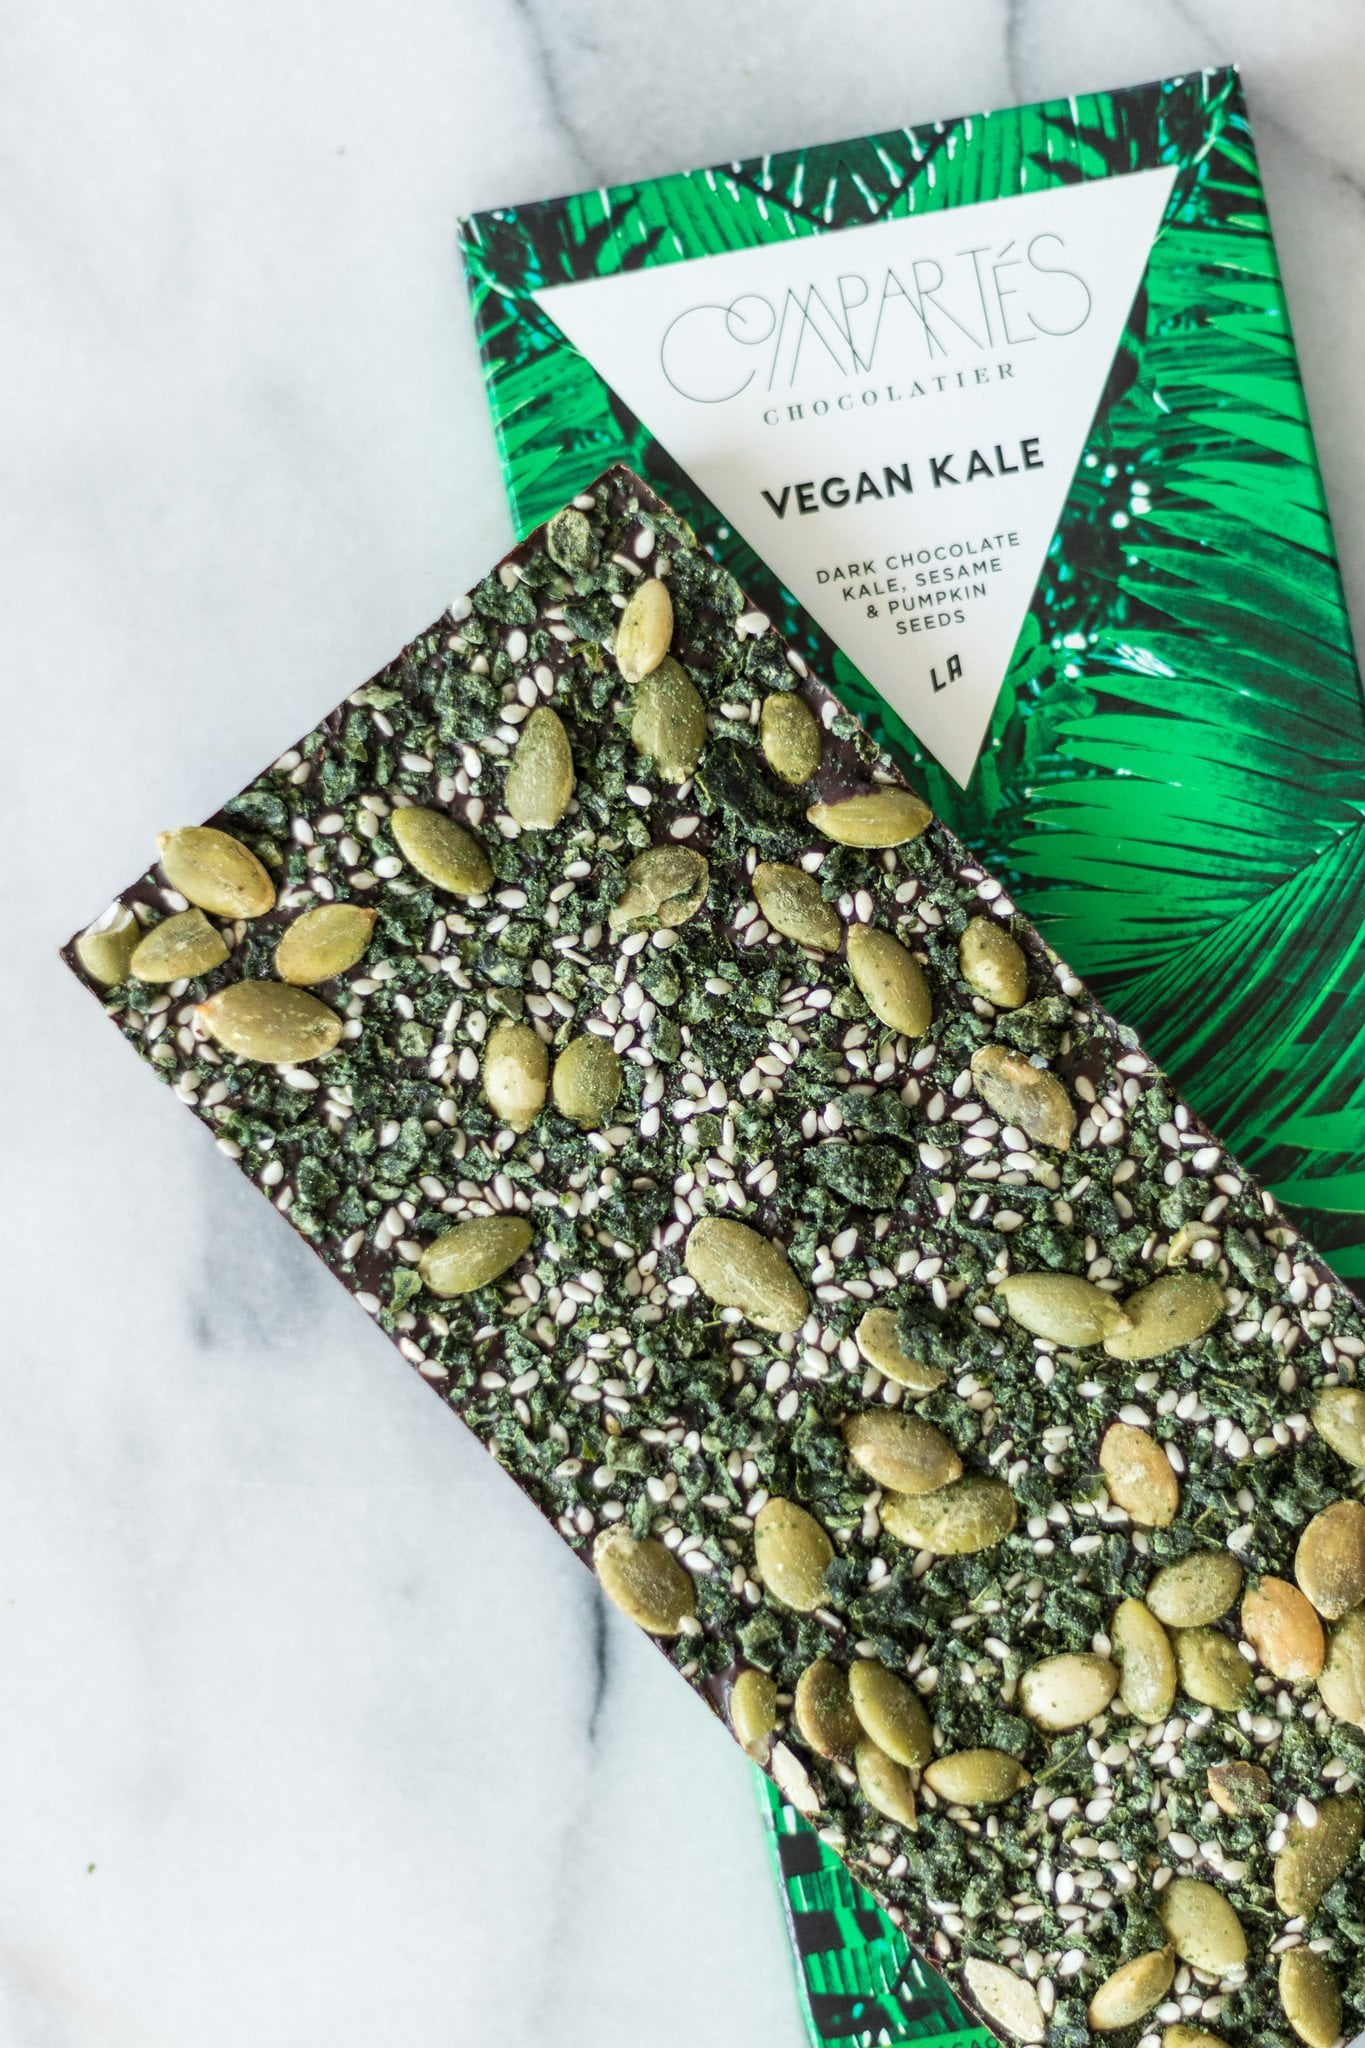 Compartes Vegan Kale Dark Chocolate Bar   POPSUGAR Fitness